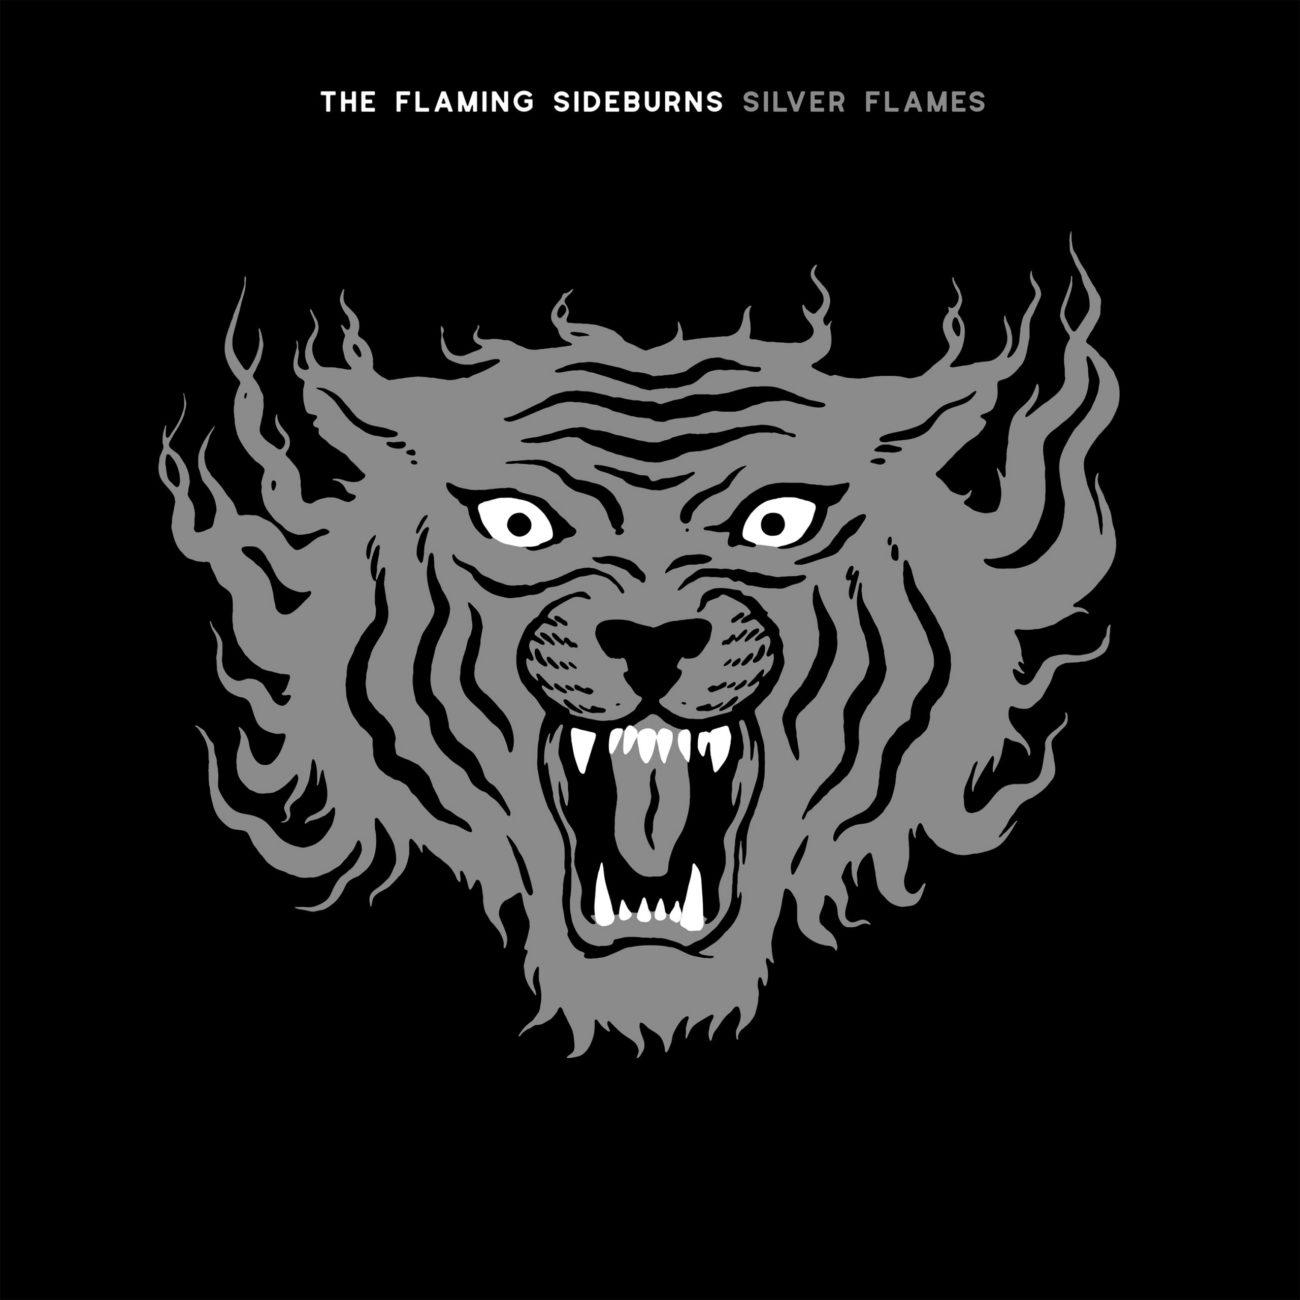 Hopeaturkkiset hyeenat eivät hyydy – arviossa The Flaming Sideburnsin Silver Flames